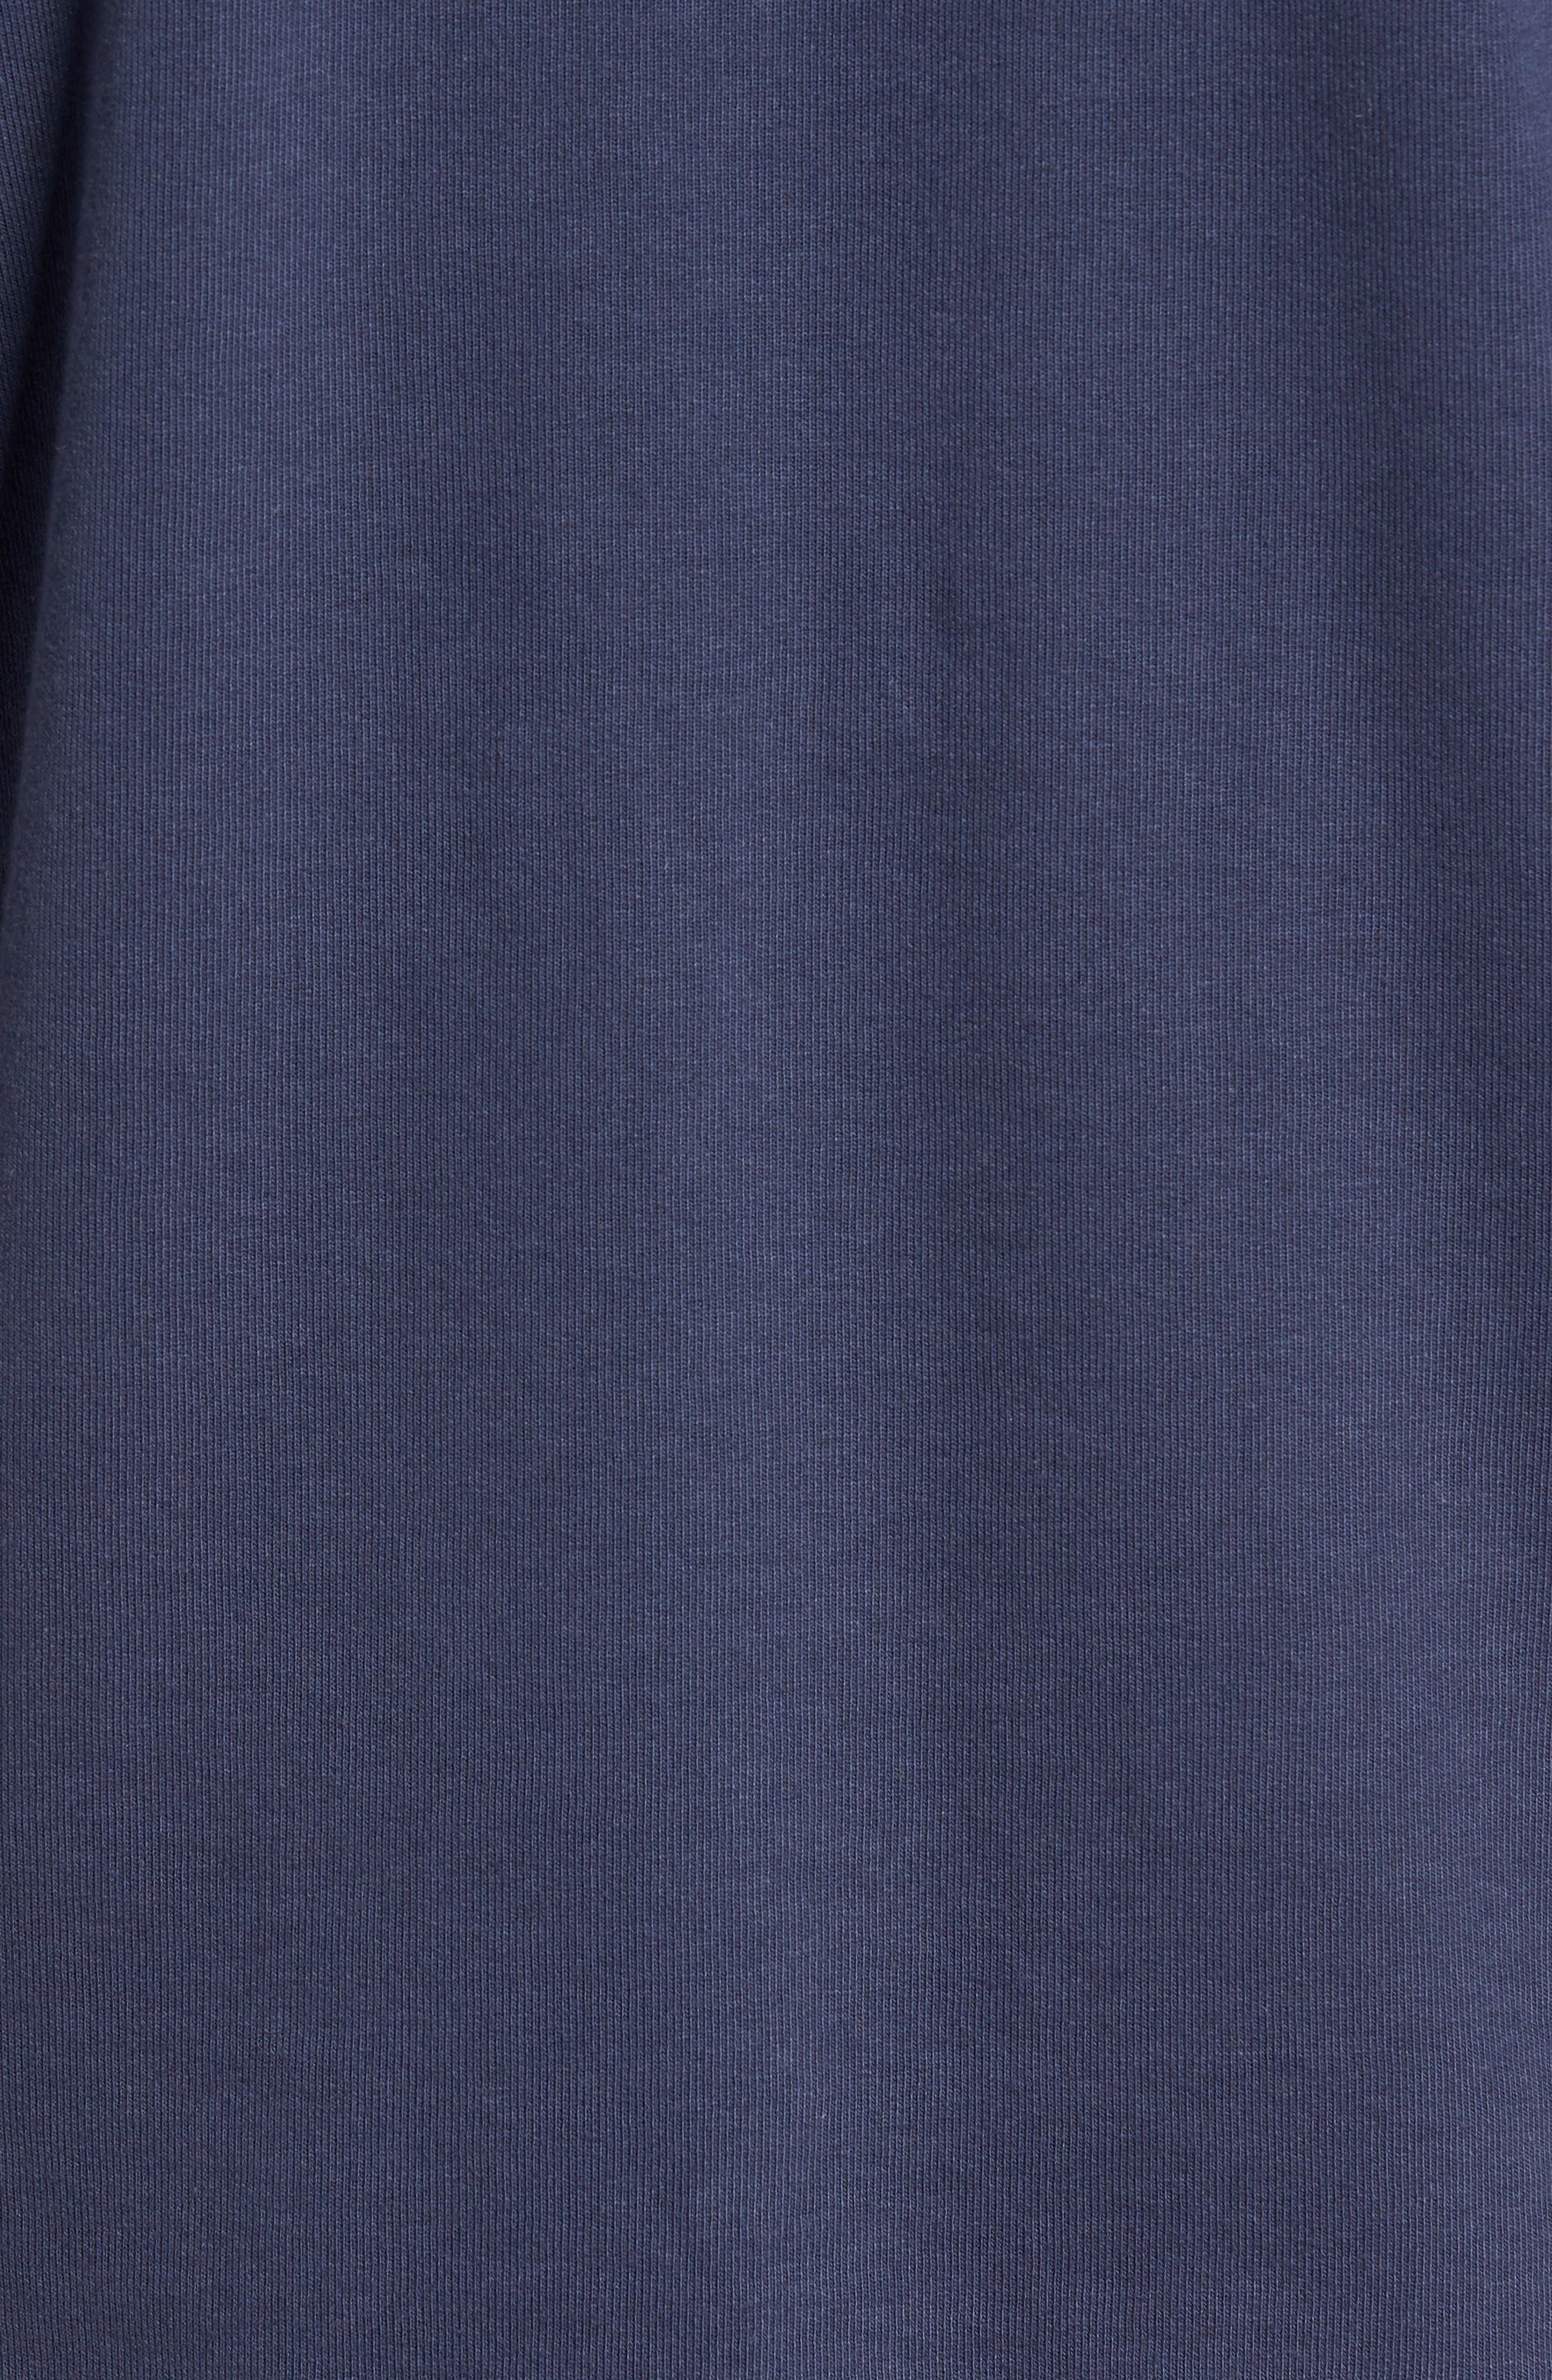 B-Side Reversible Crewneck Sweatshirt,                             Alternate thumbnail 33, color,